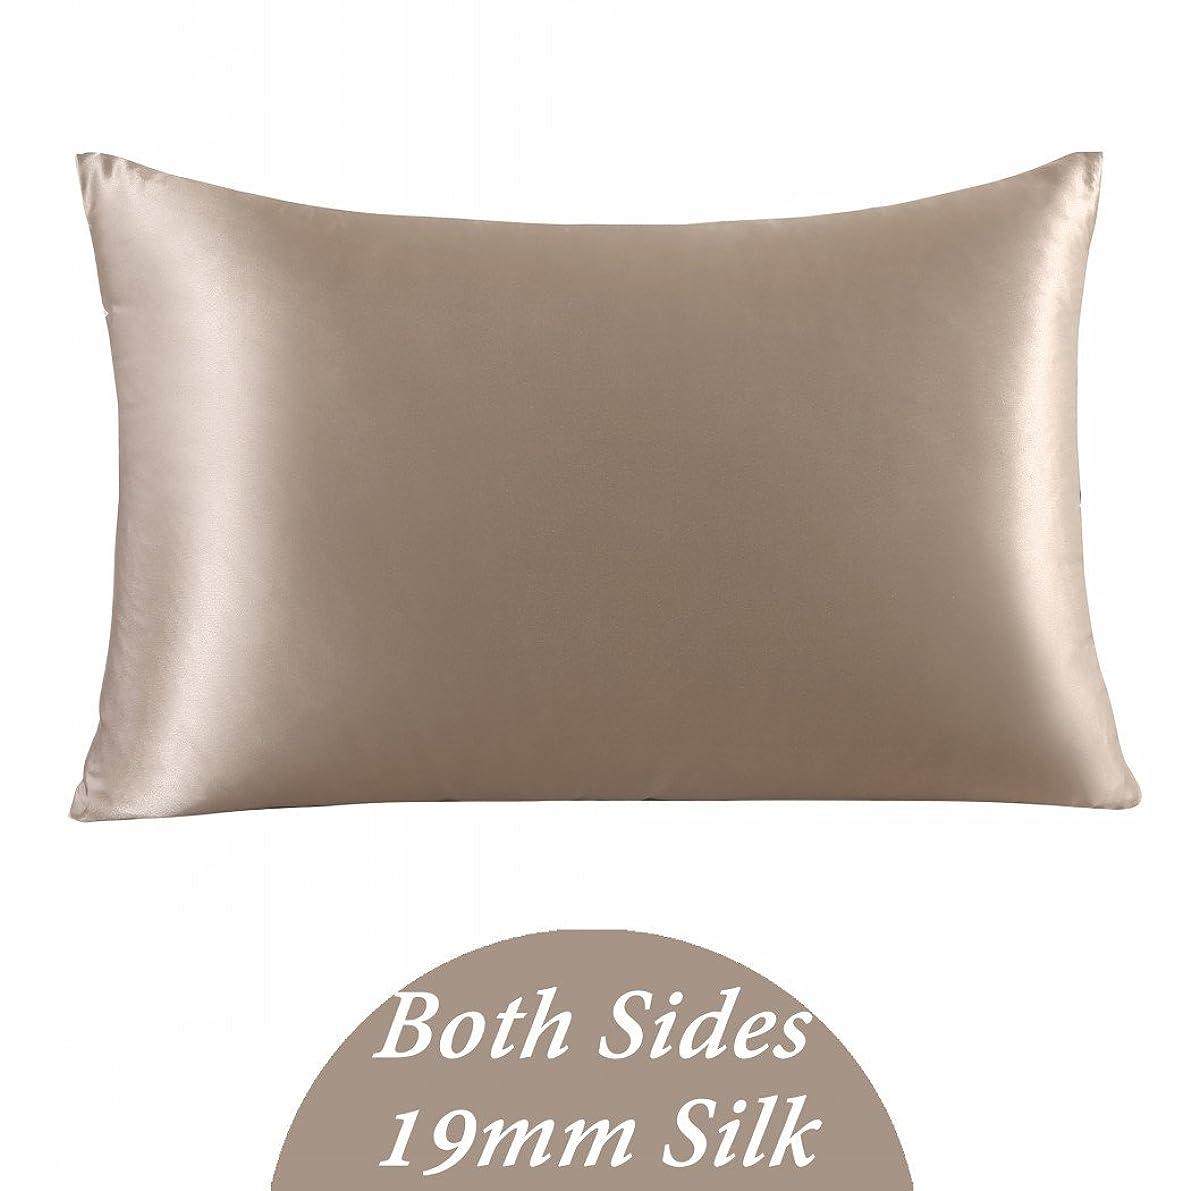 ZIMASILK 100% Mulberry Silk Pillowcase for Hair and Skin,with Hidden Zipper,Both Side 19 Momme Silk,600 Thread Count, 1pc (Queen 20''x30'', Taupe) gkshbou34